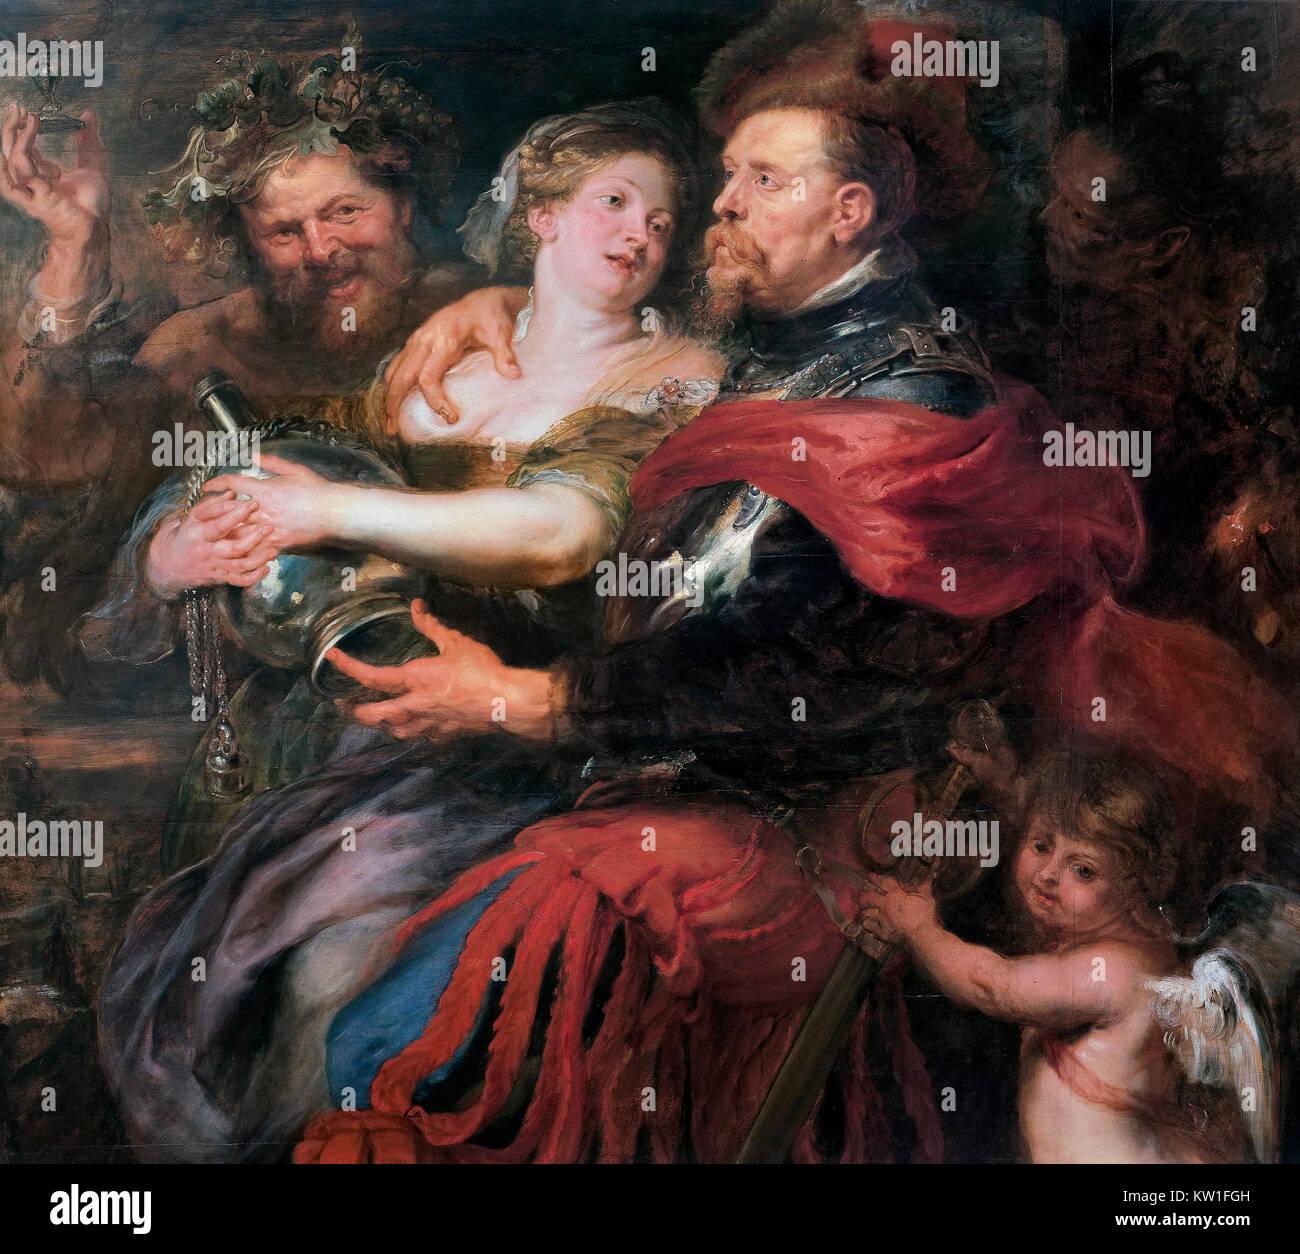 Venus and Mars by Peter Paul Rubens (1577-1640), oil on panel, c.1632-35 - Stock Image